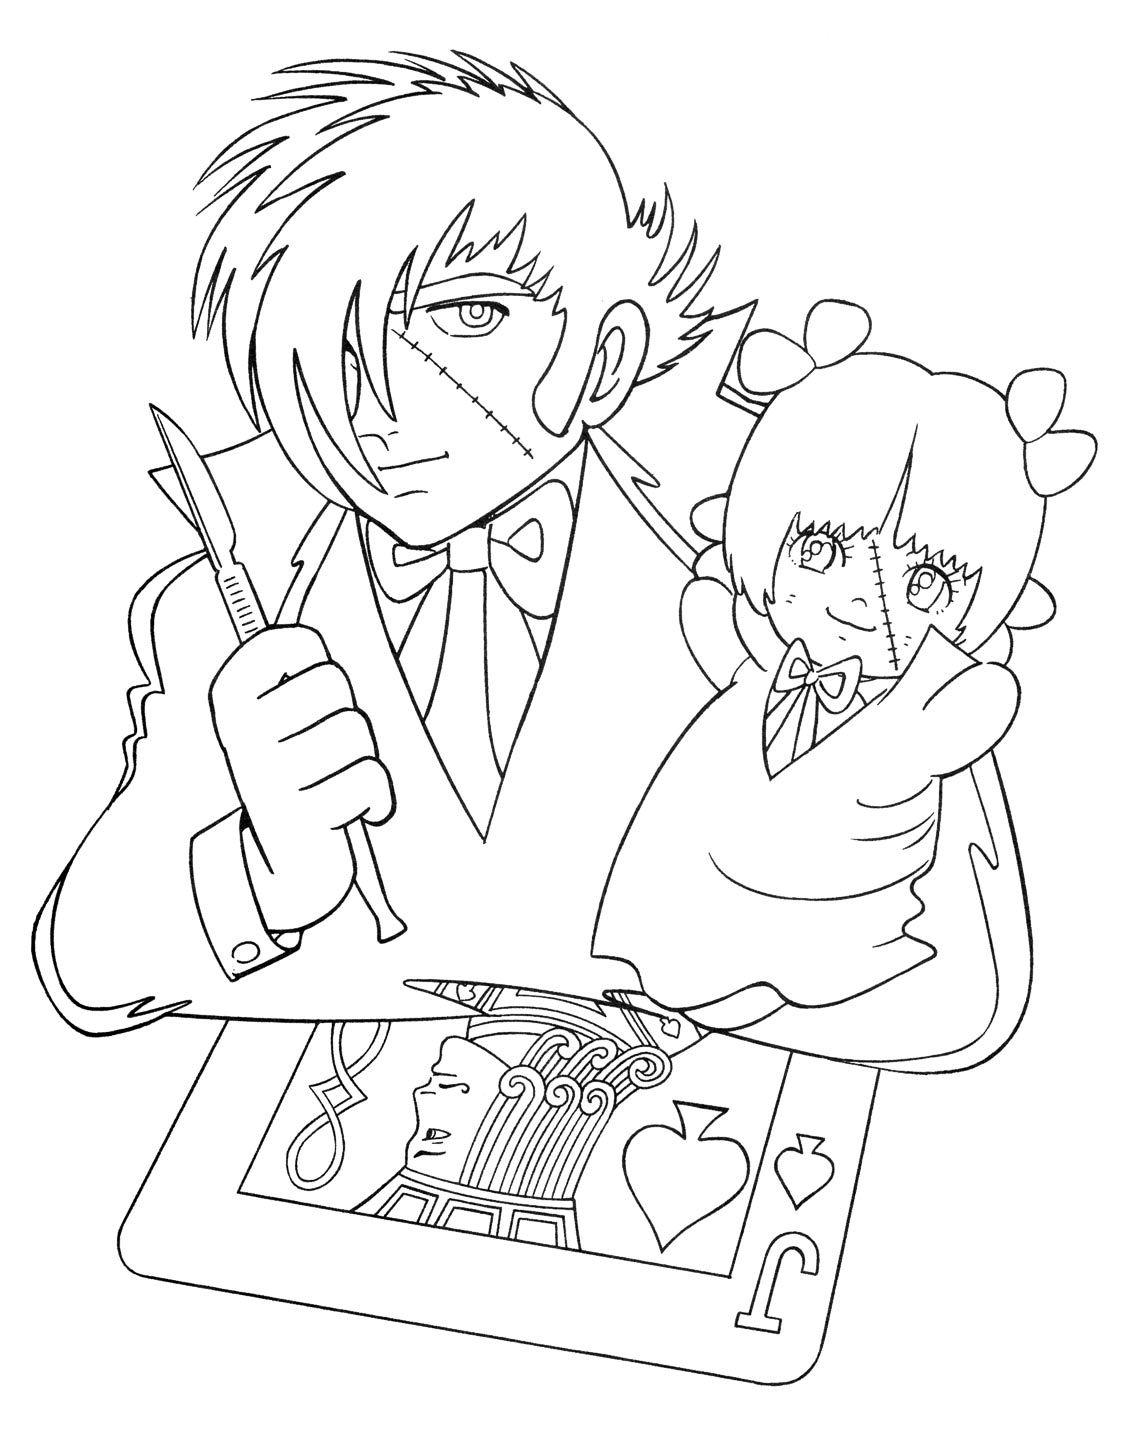 http://www.oasidelleanime.com/minisiti/colorare/tezuka/original1/Osamu_Tezuka_coloring_book_13.jpg